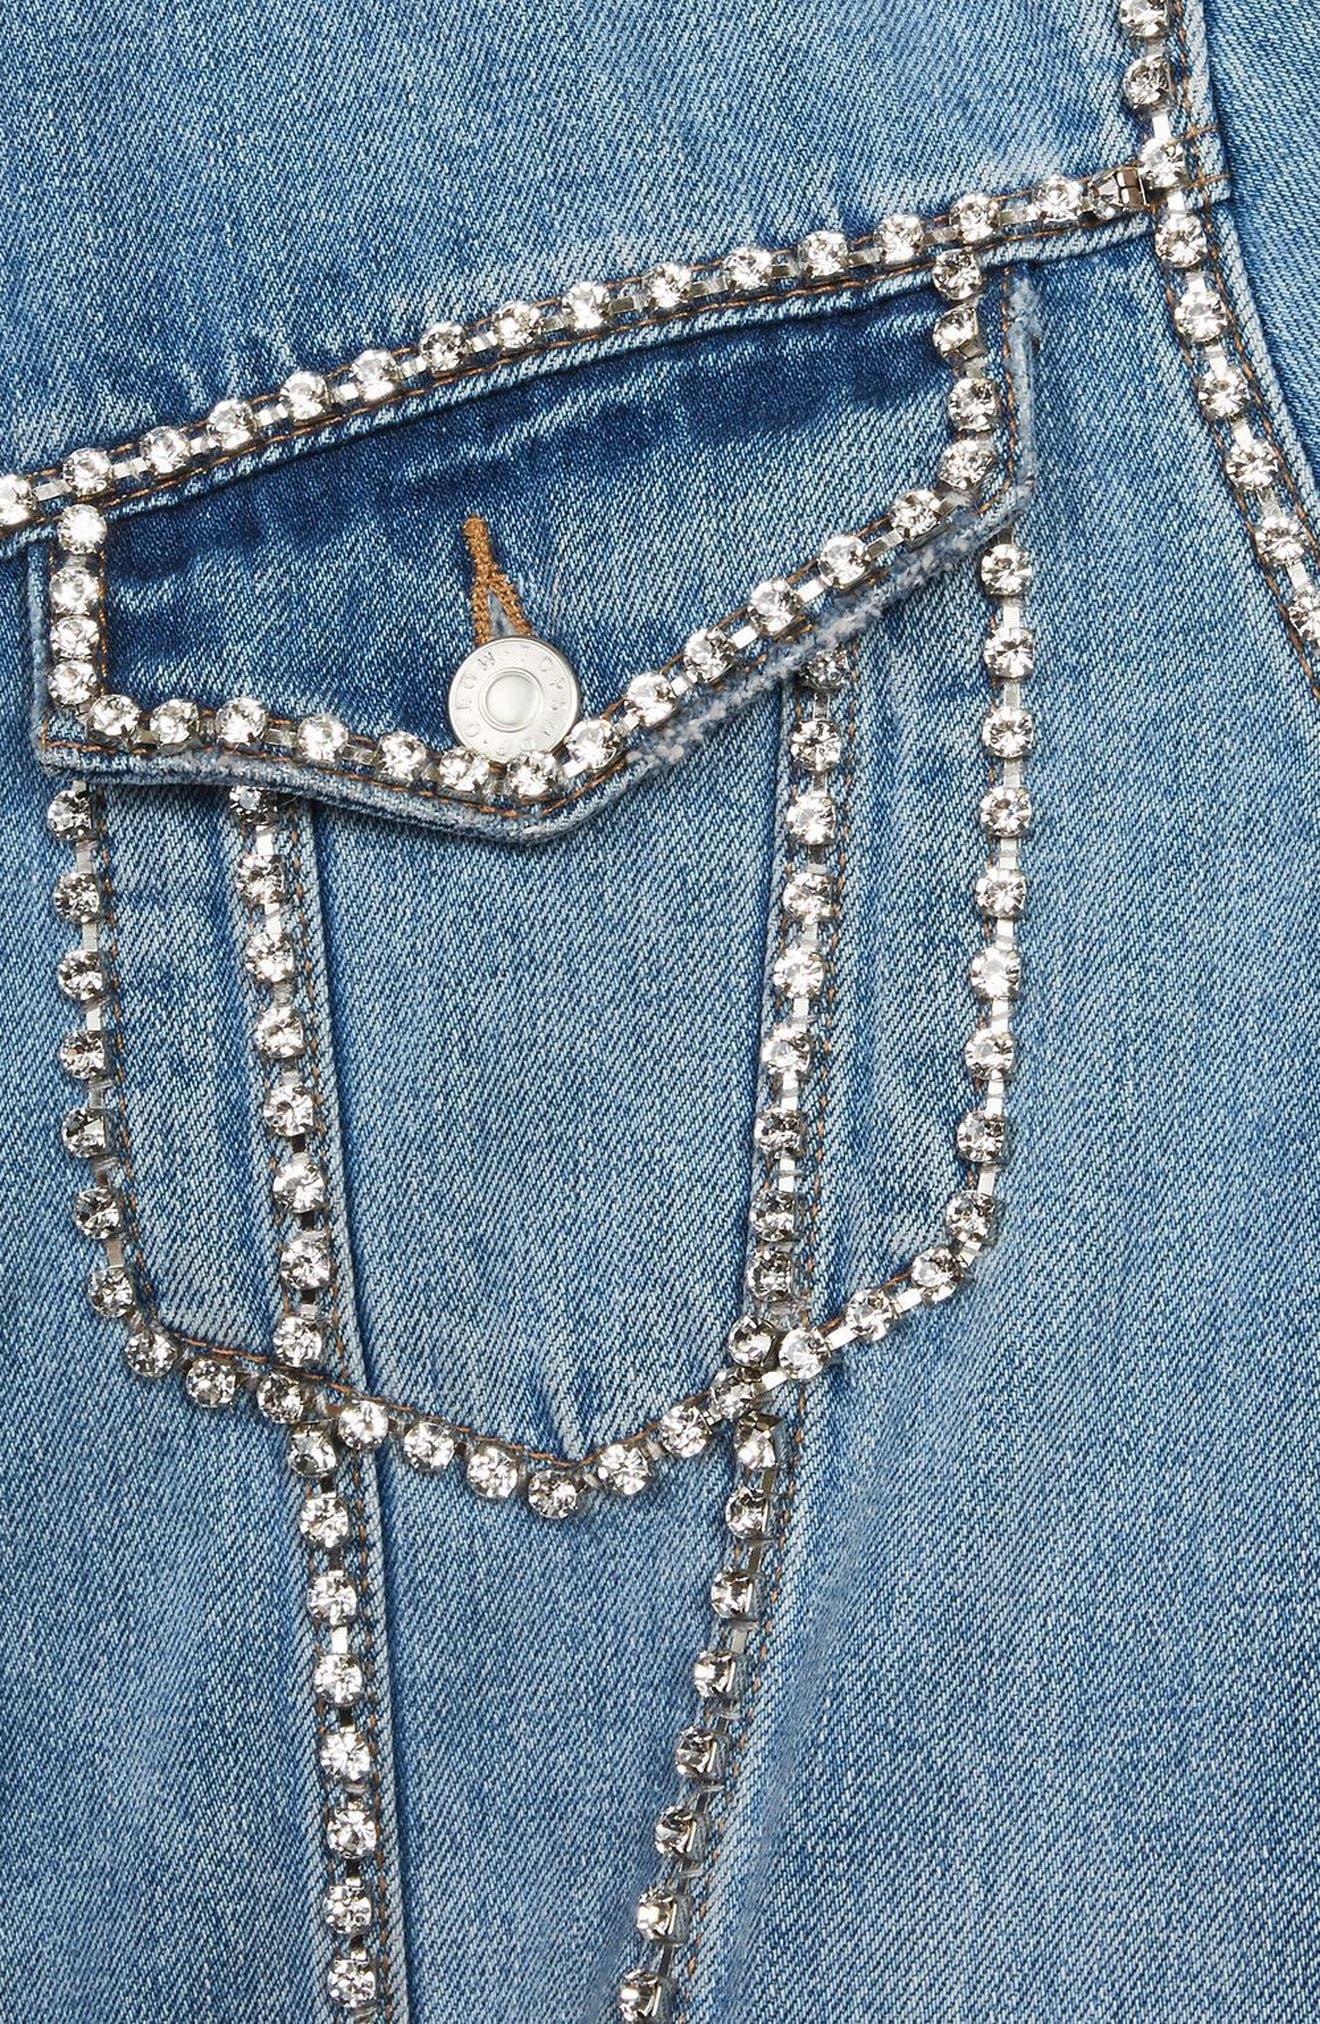 Oversize Crystal Seam Denim Jacket,                             Alternate thumbnail 4, color,                             Mid Denim